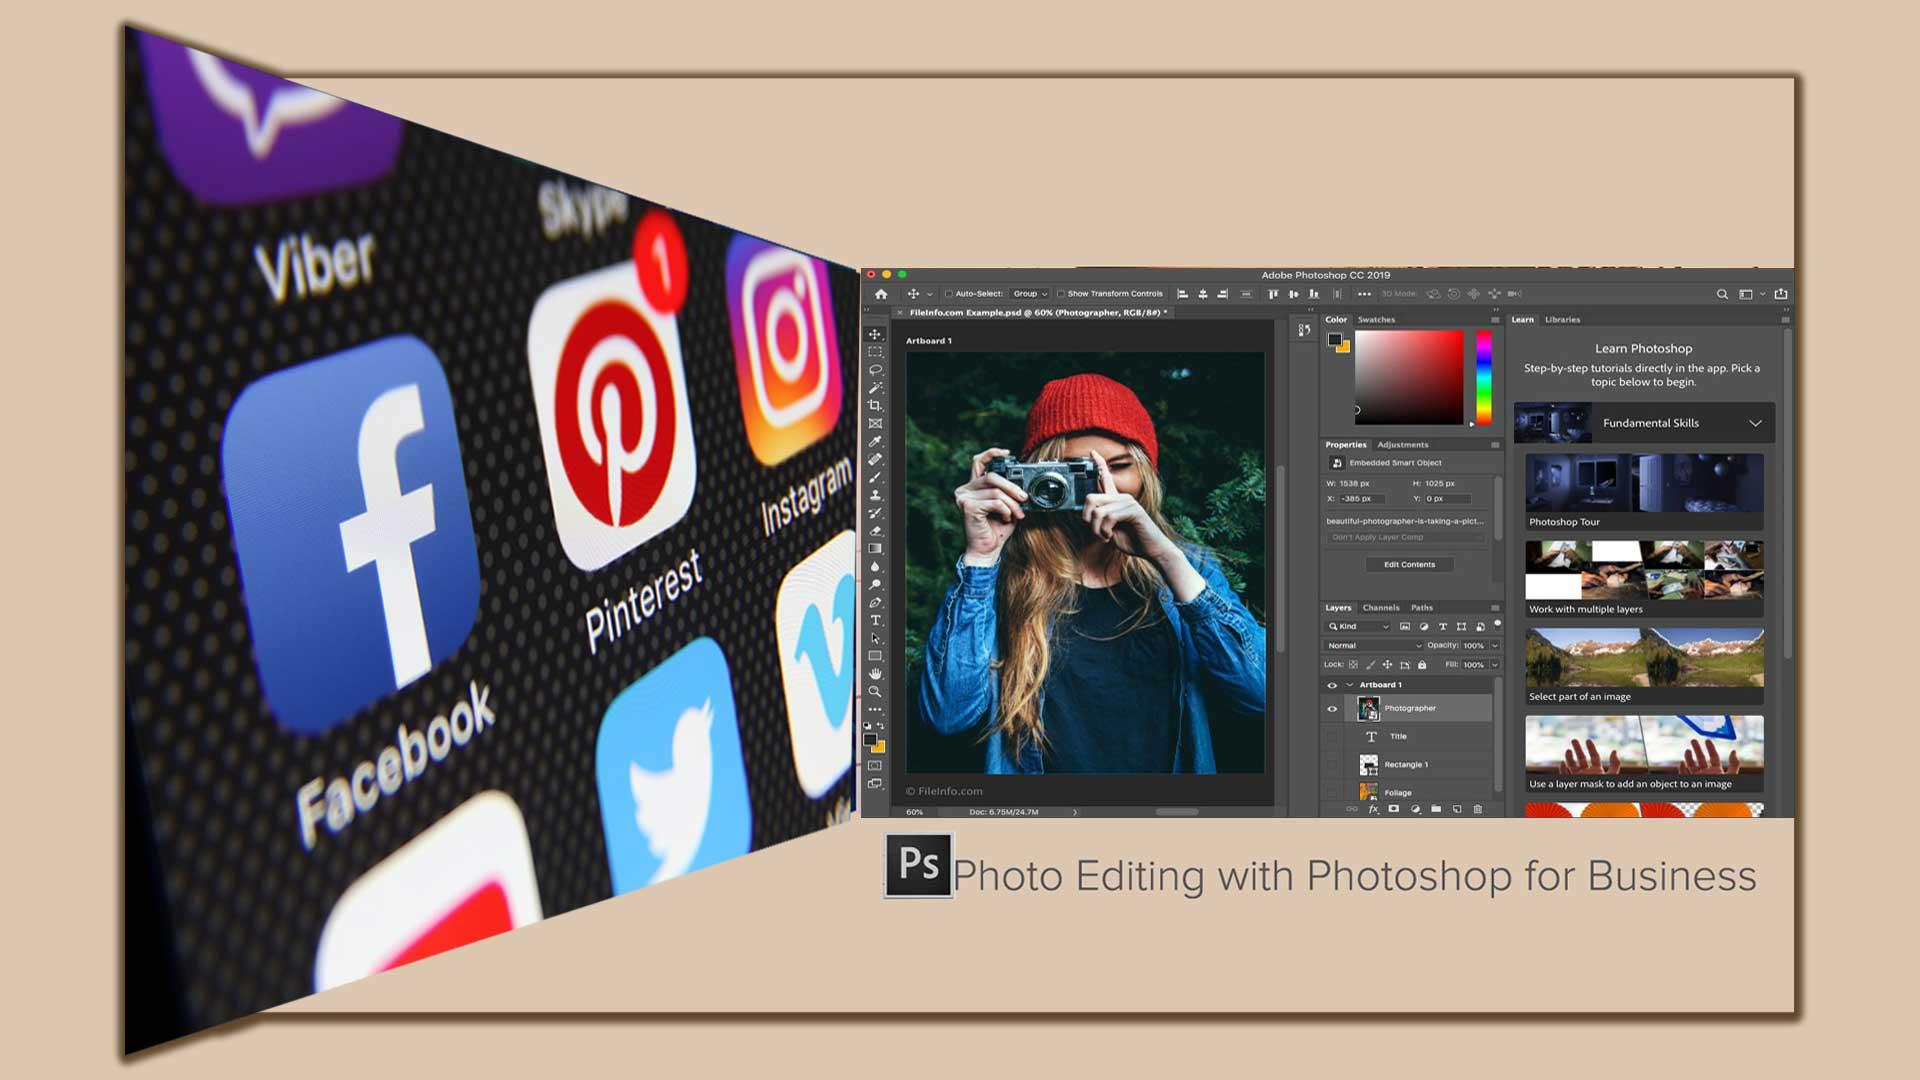 Photo editing  Photoshop 7 - 8 تا از مزایای اصلی ویرایش عکس با فتوشاپ برای کسب و کارتان